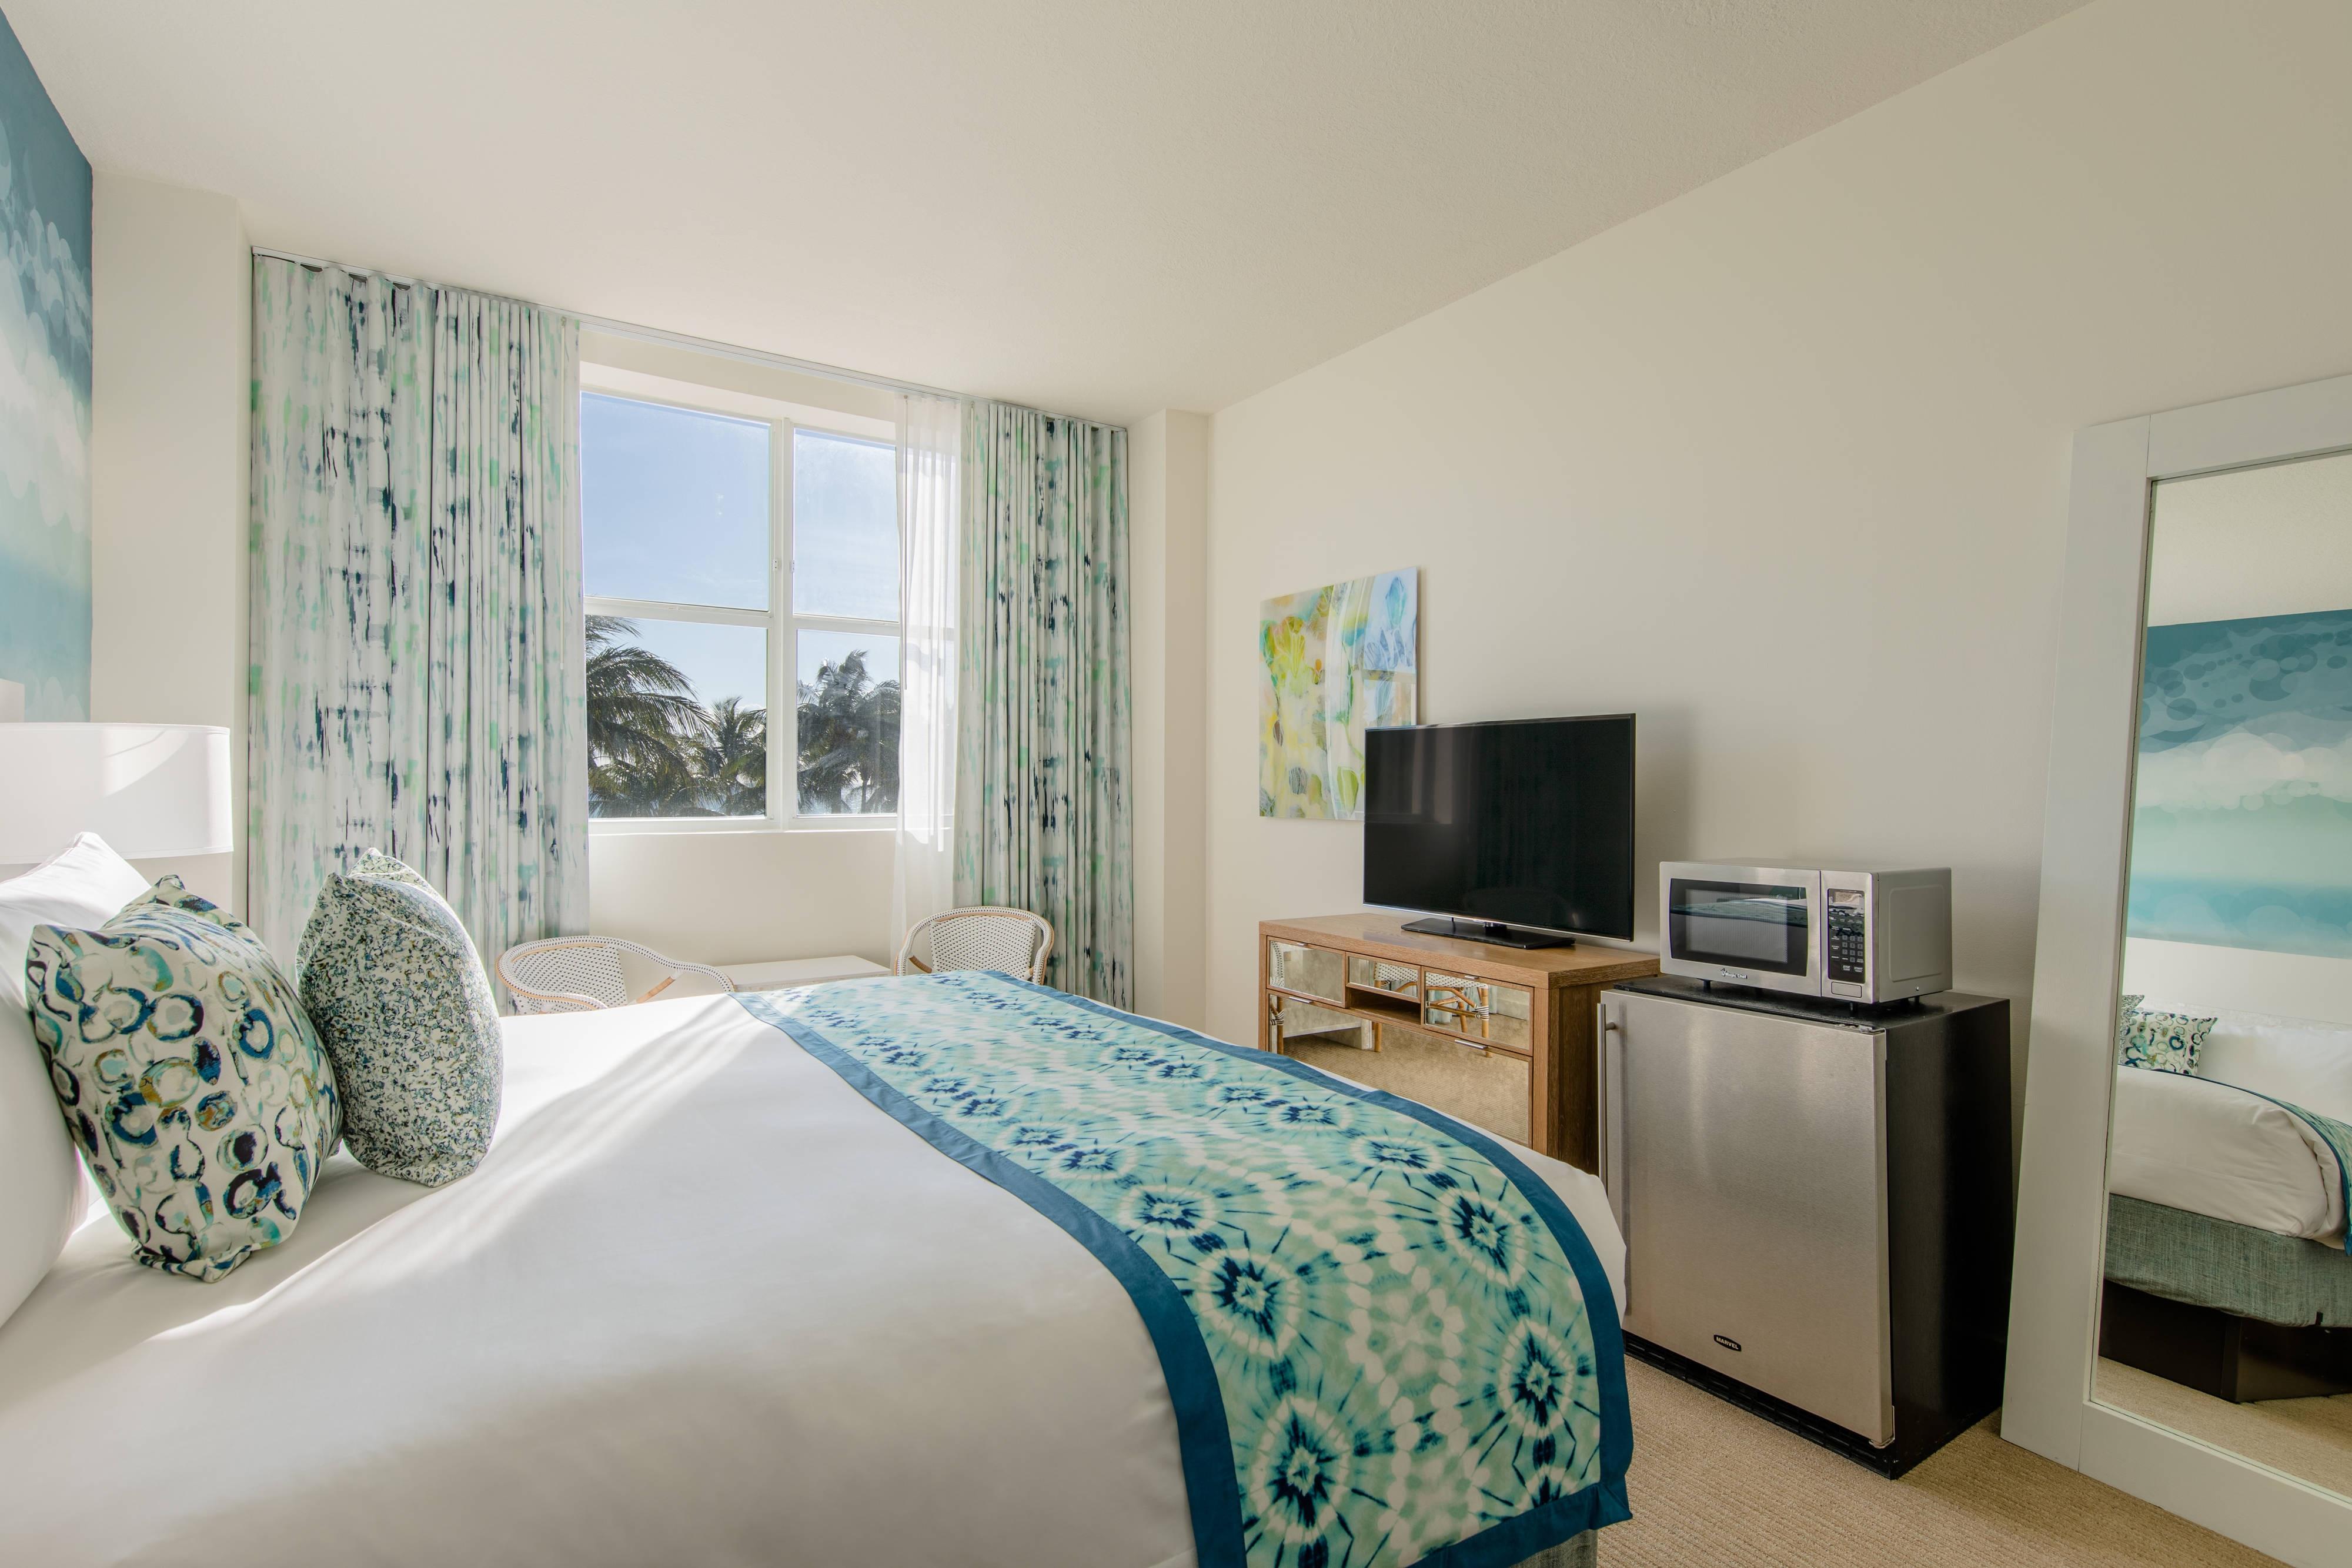 2 bedroom suites in south beach fl marriott vacation - 2 bedroom suites south beach miami ...